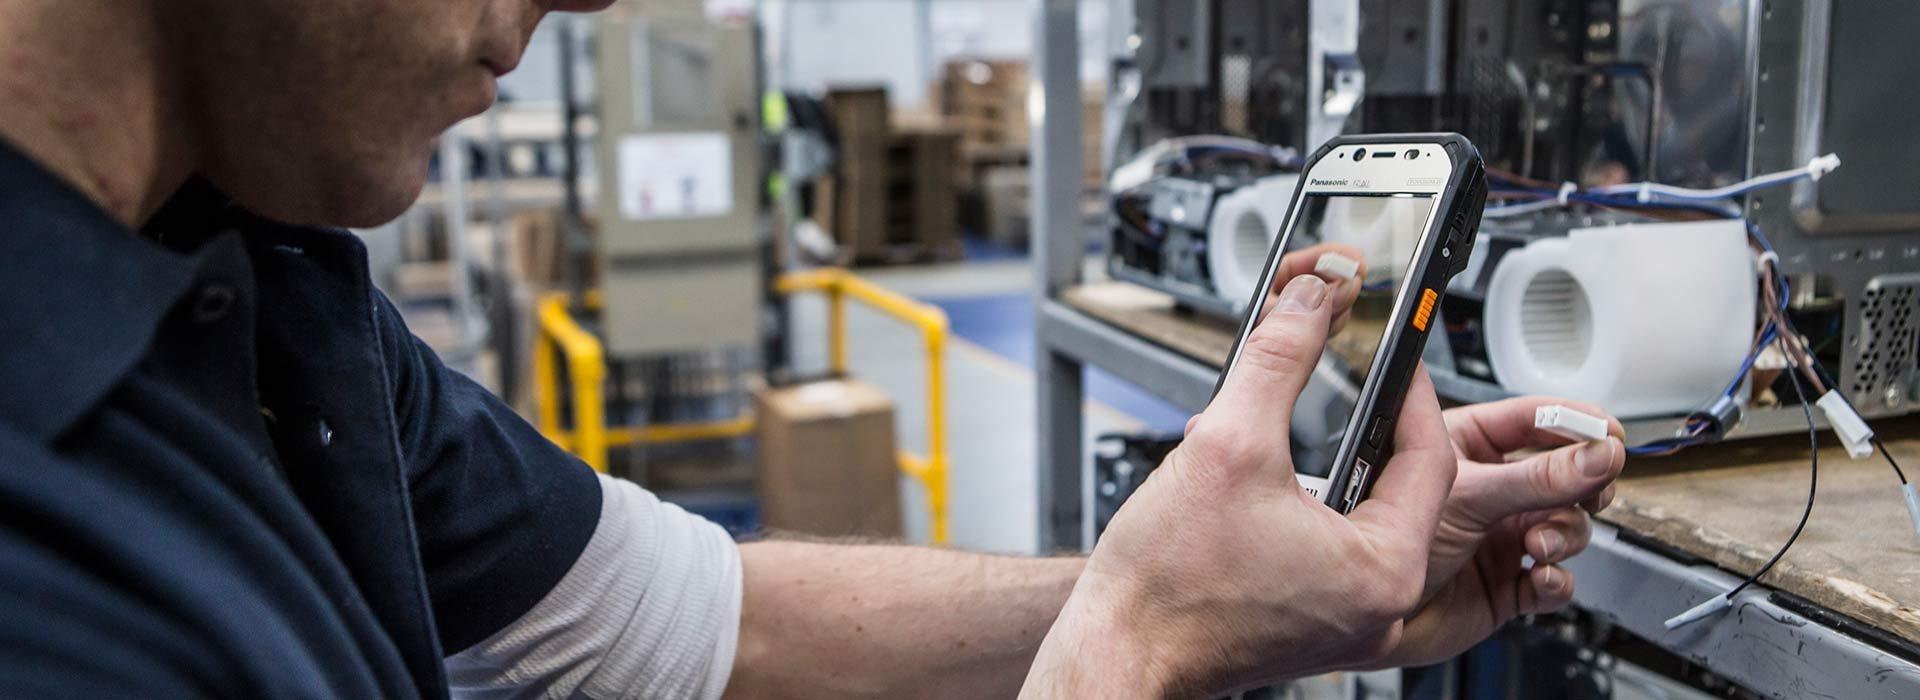 Industrie & Produktion MDE Geräte